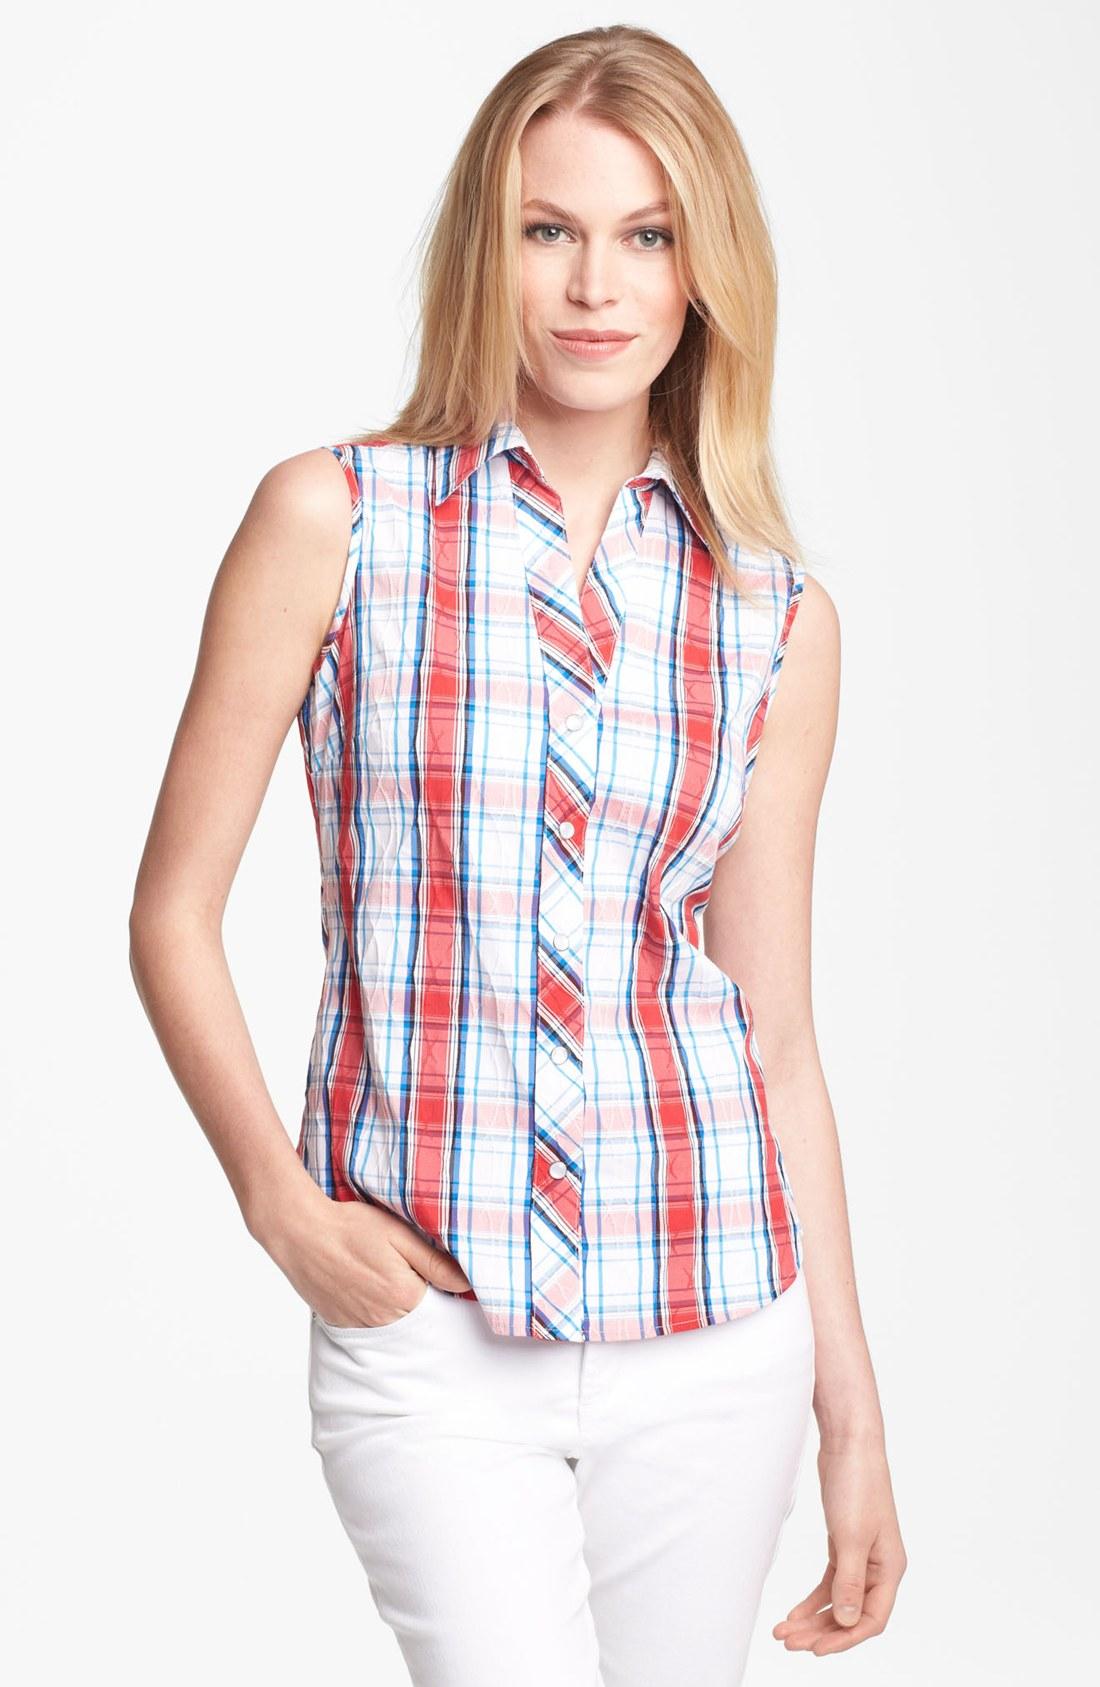 Foxcroft Sleeveless Crinkled Plaid Shirt Petite In Red